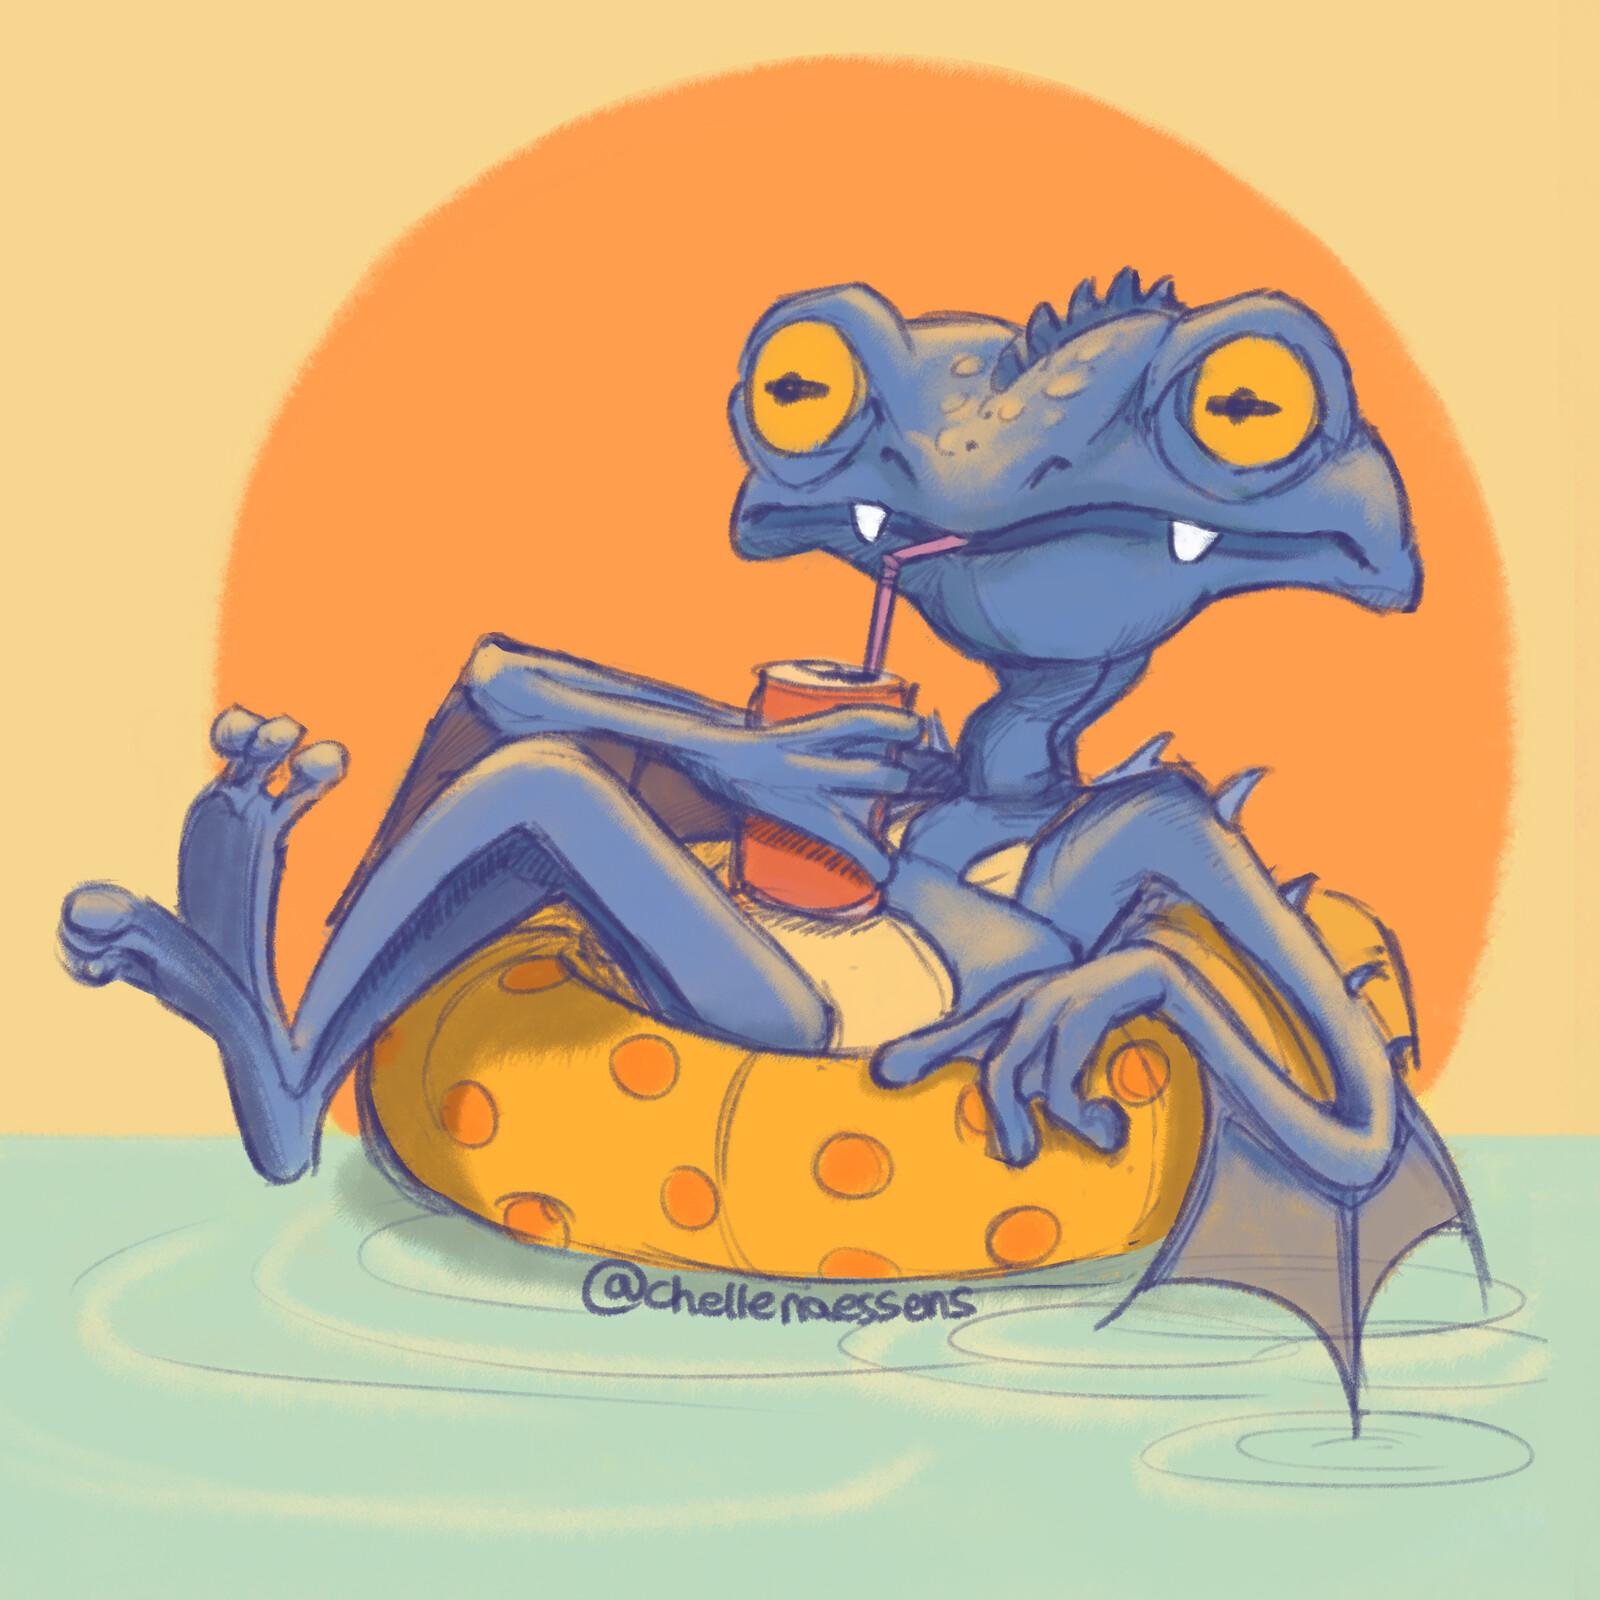 Day 10: Blue Dragon